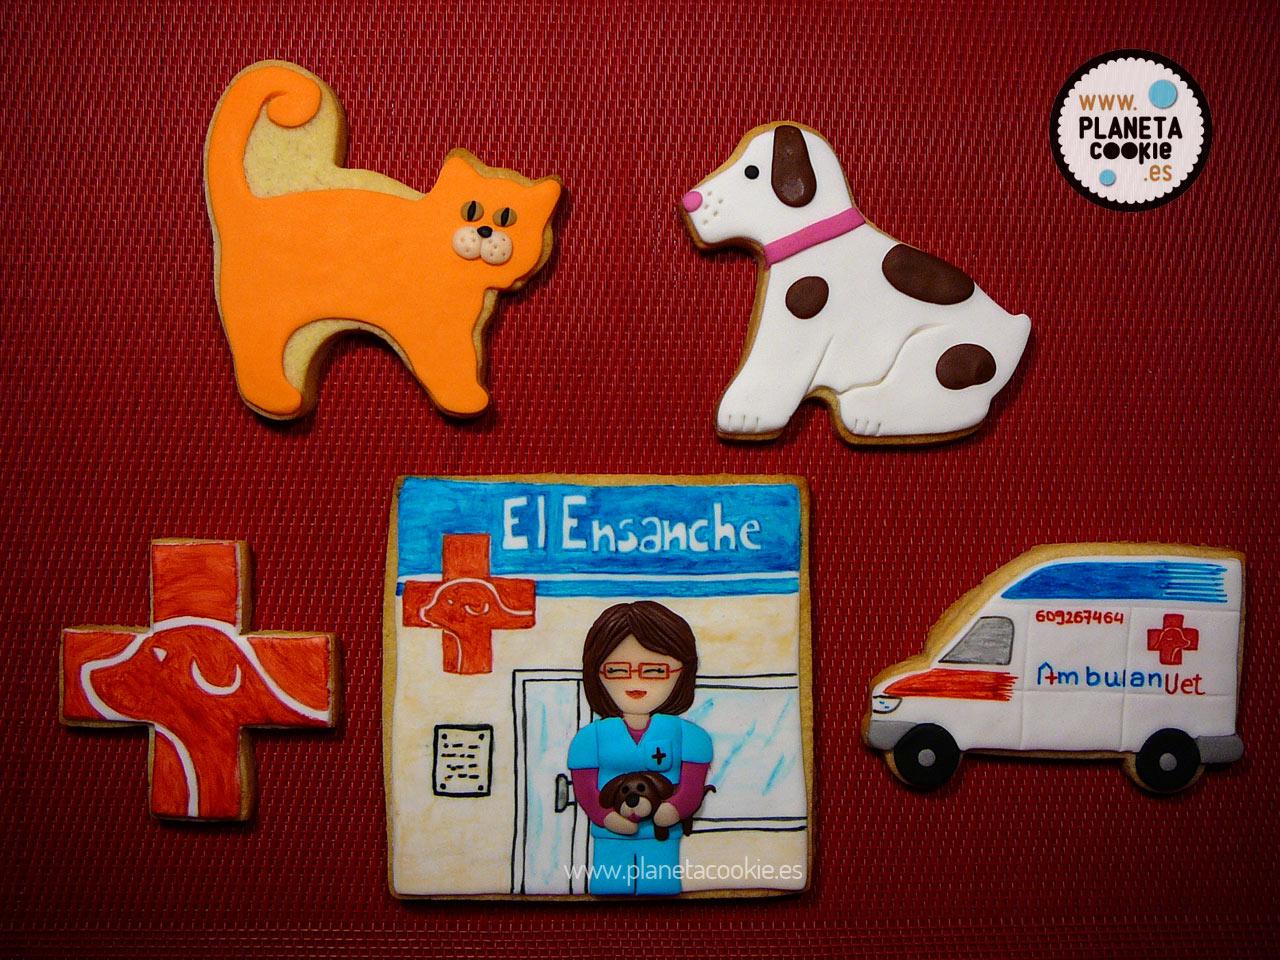 perros | Planeta Cookie